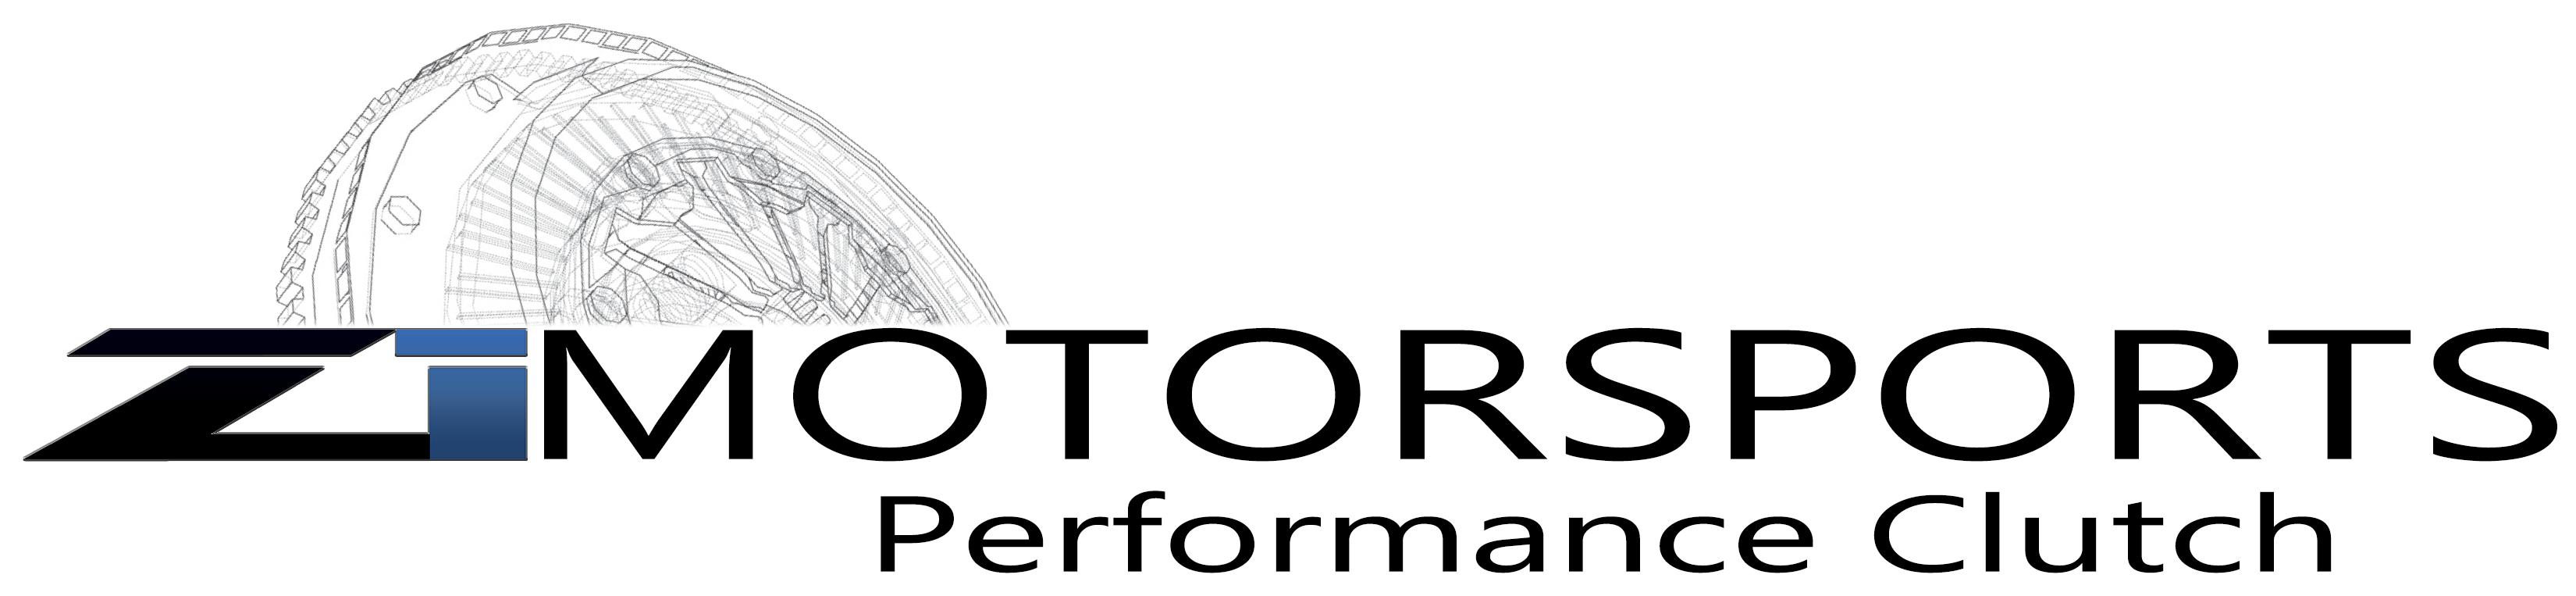 Z1 Motorsports 350Z G35 VQ35DE Performance Parts